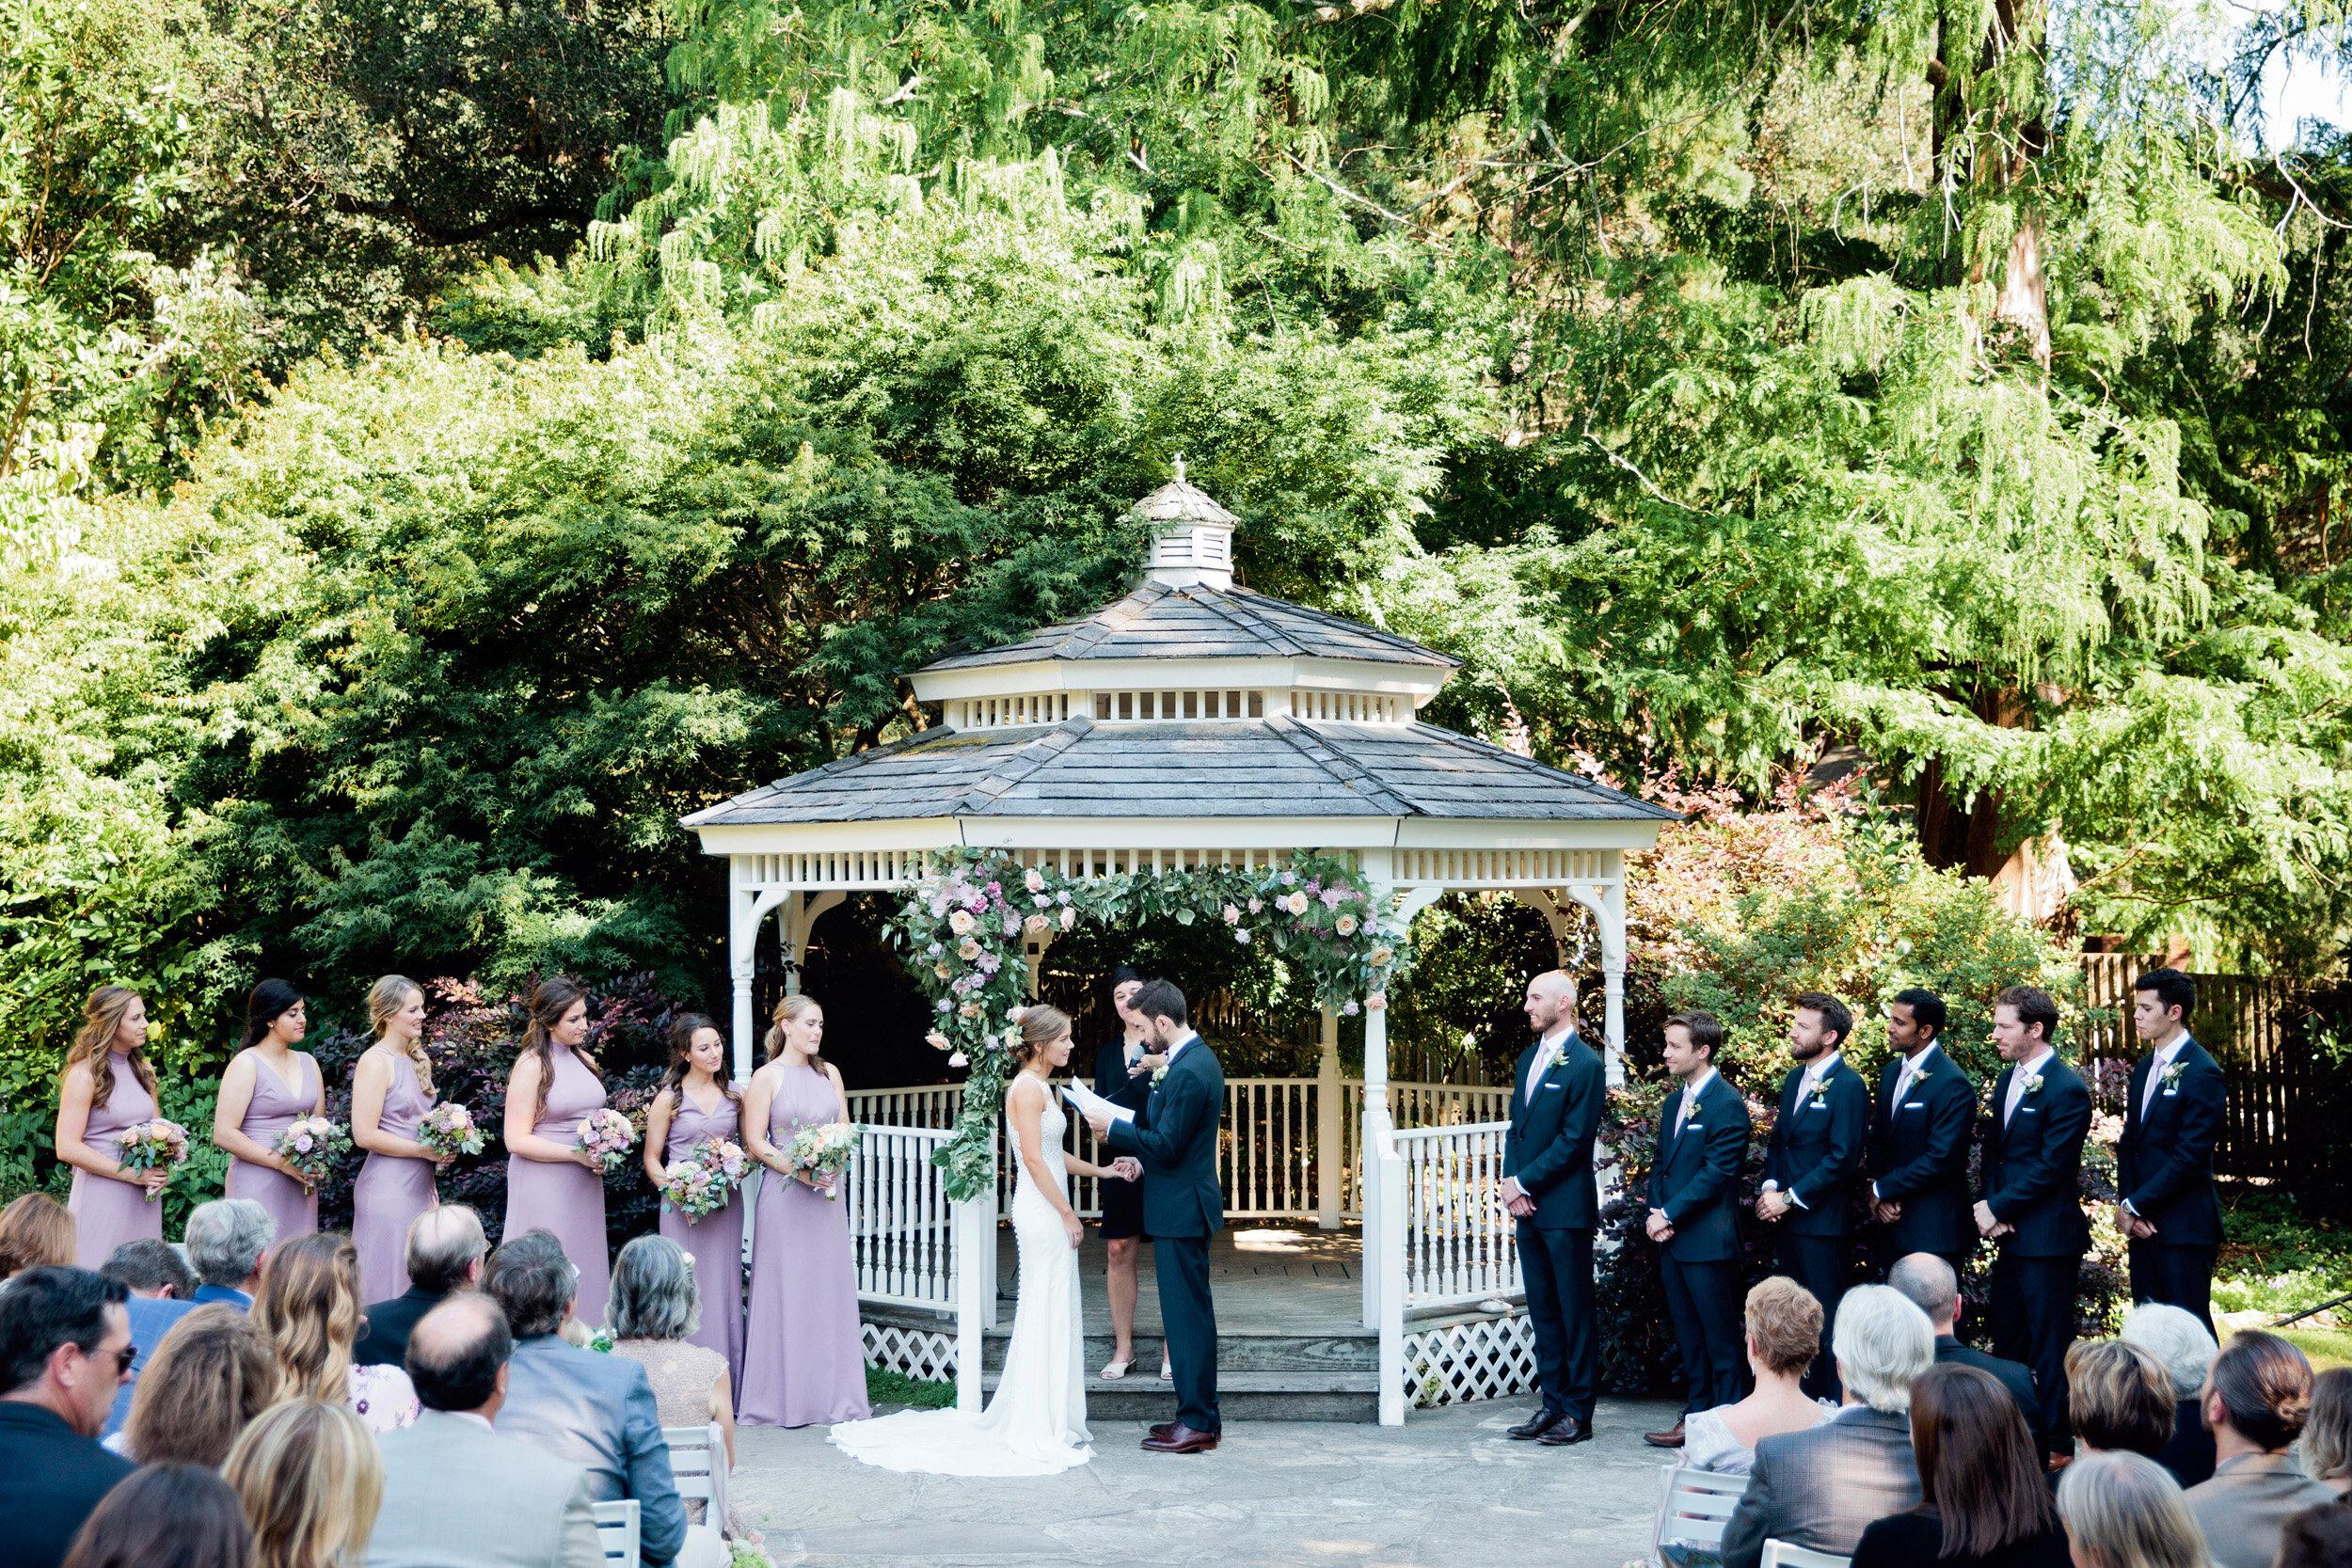 Marin-Art-Garden-Center-Wedding-31.JPG